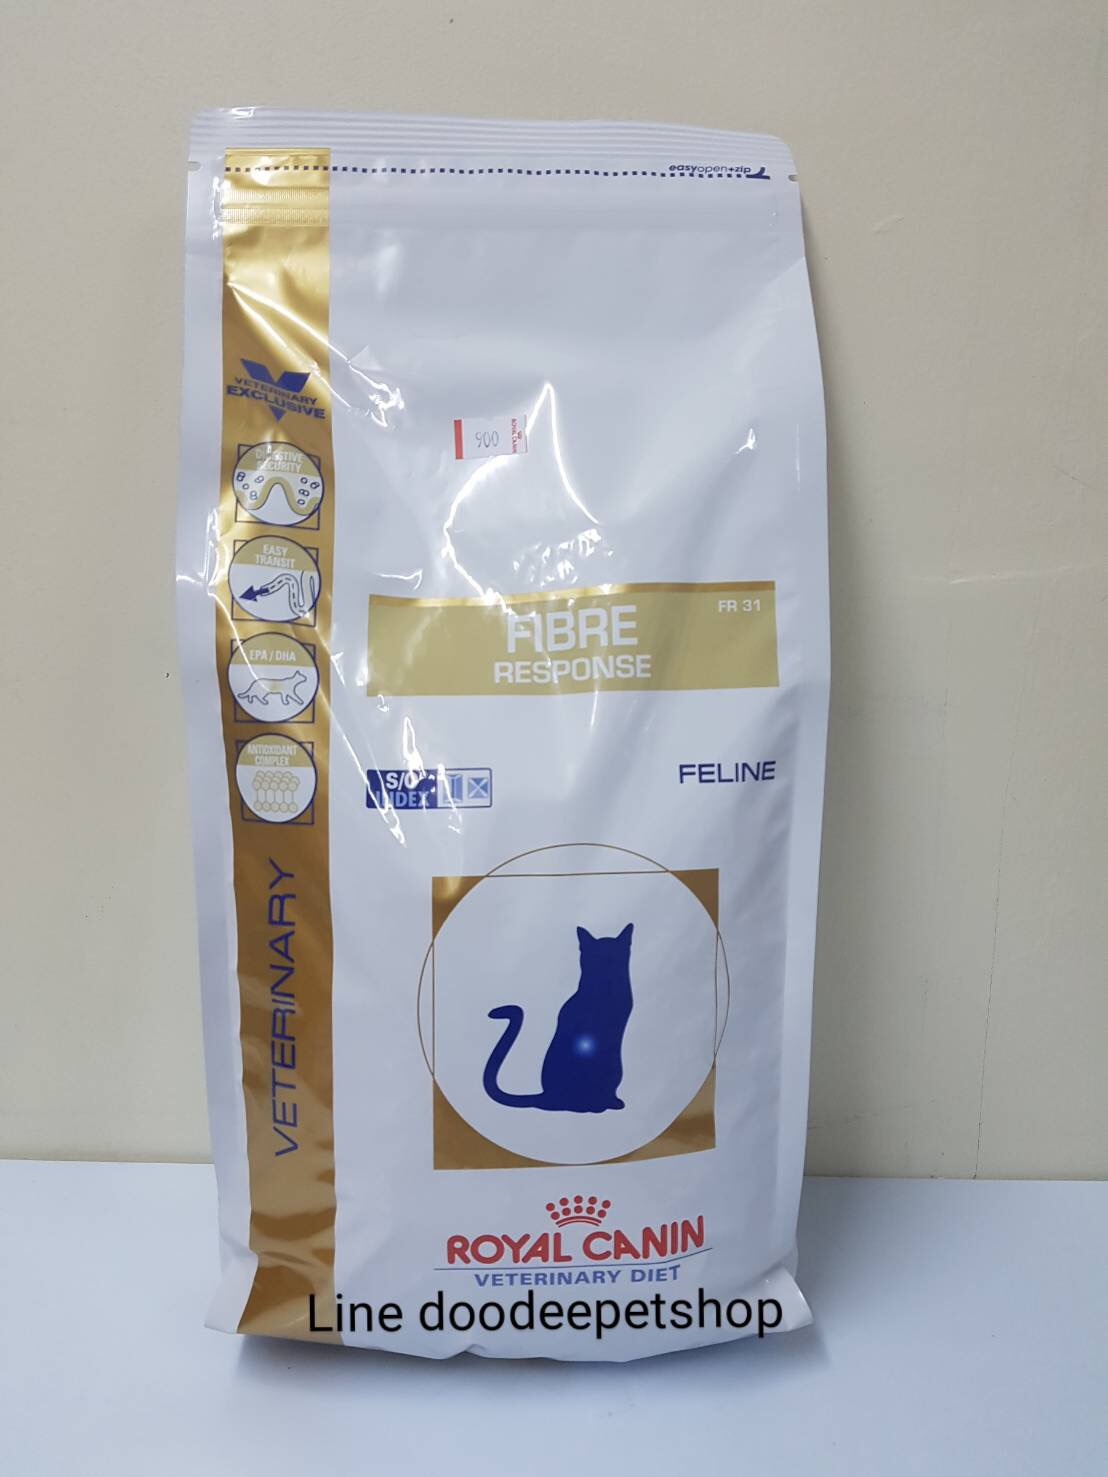 Fibre 2 kg.Exp.05/19 แมวโรคท้องผูก